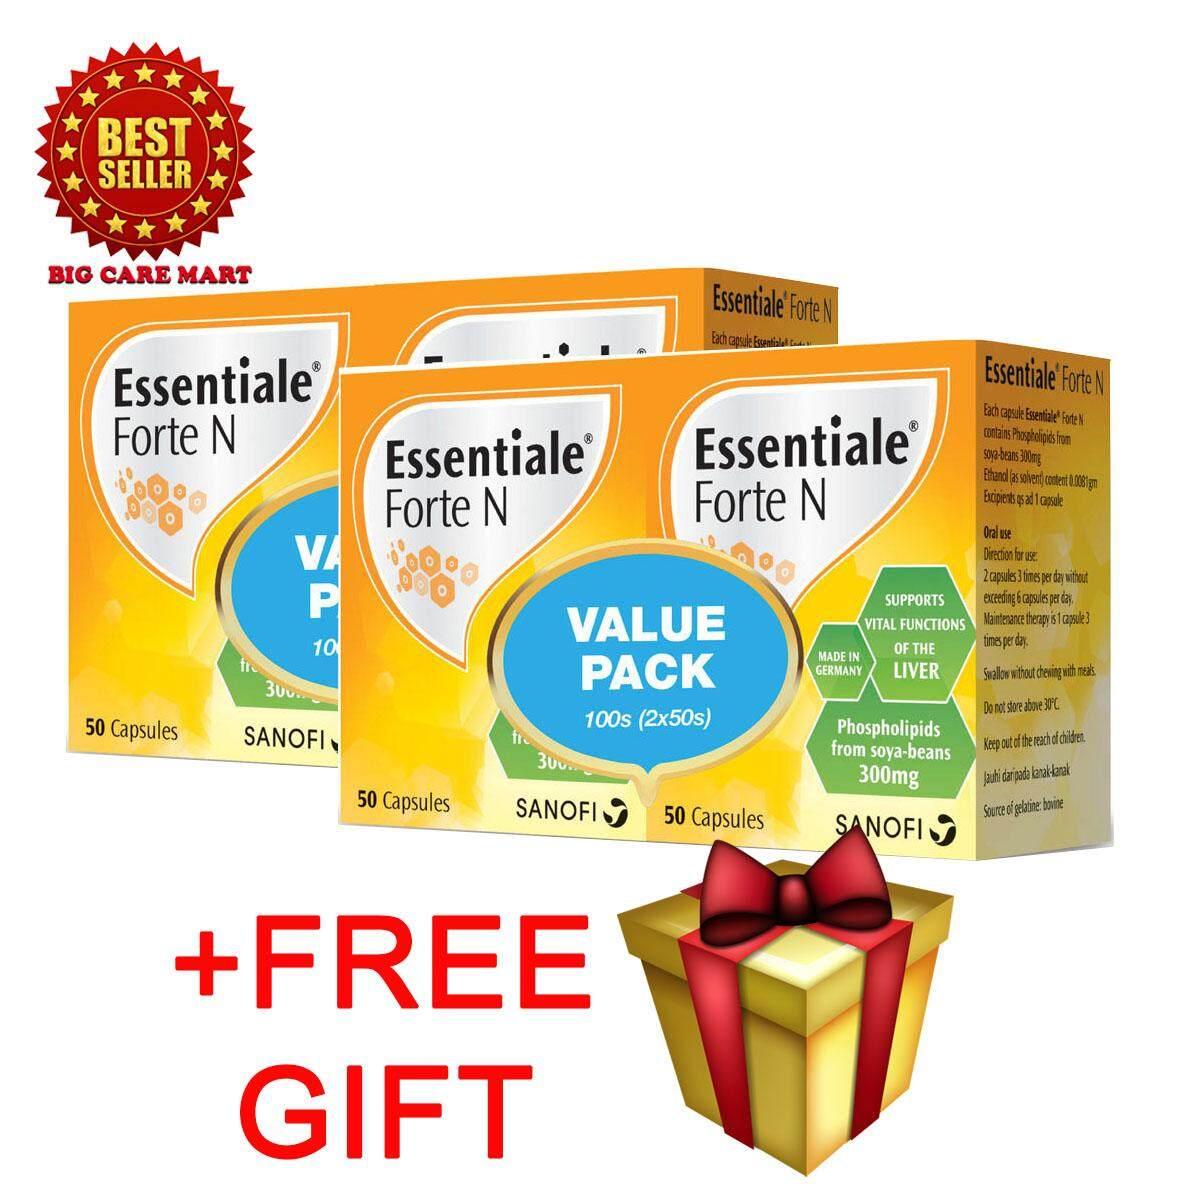 Essentiale Forte N 2 X 100s ( Liver Vitamin)  + FREE GIFT